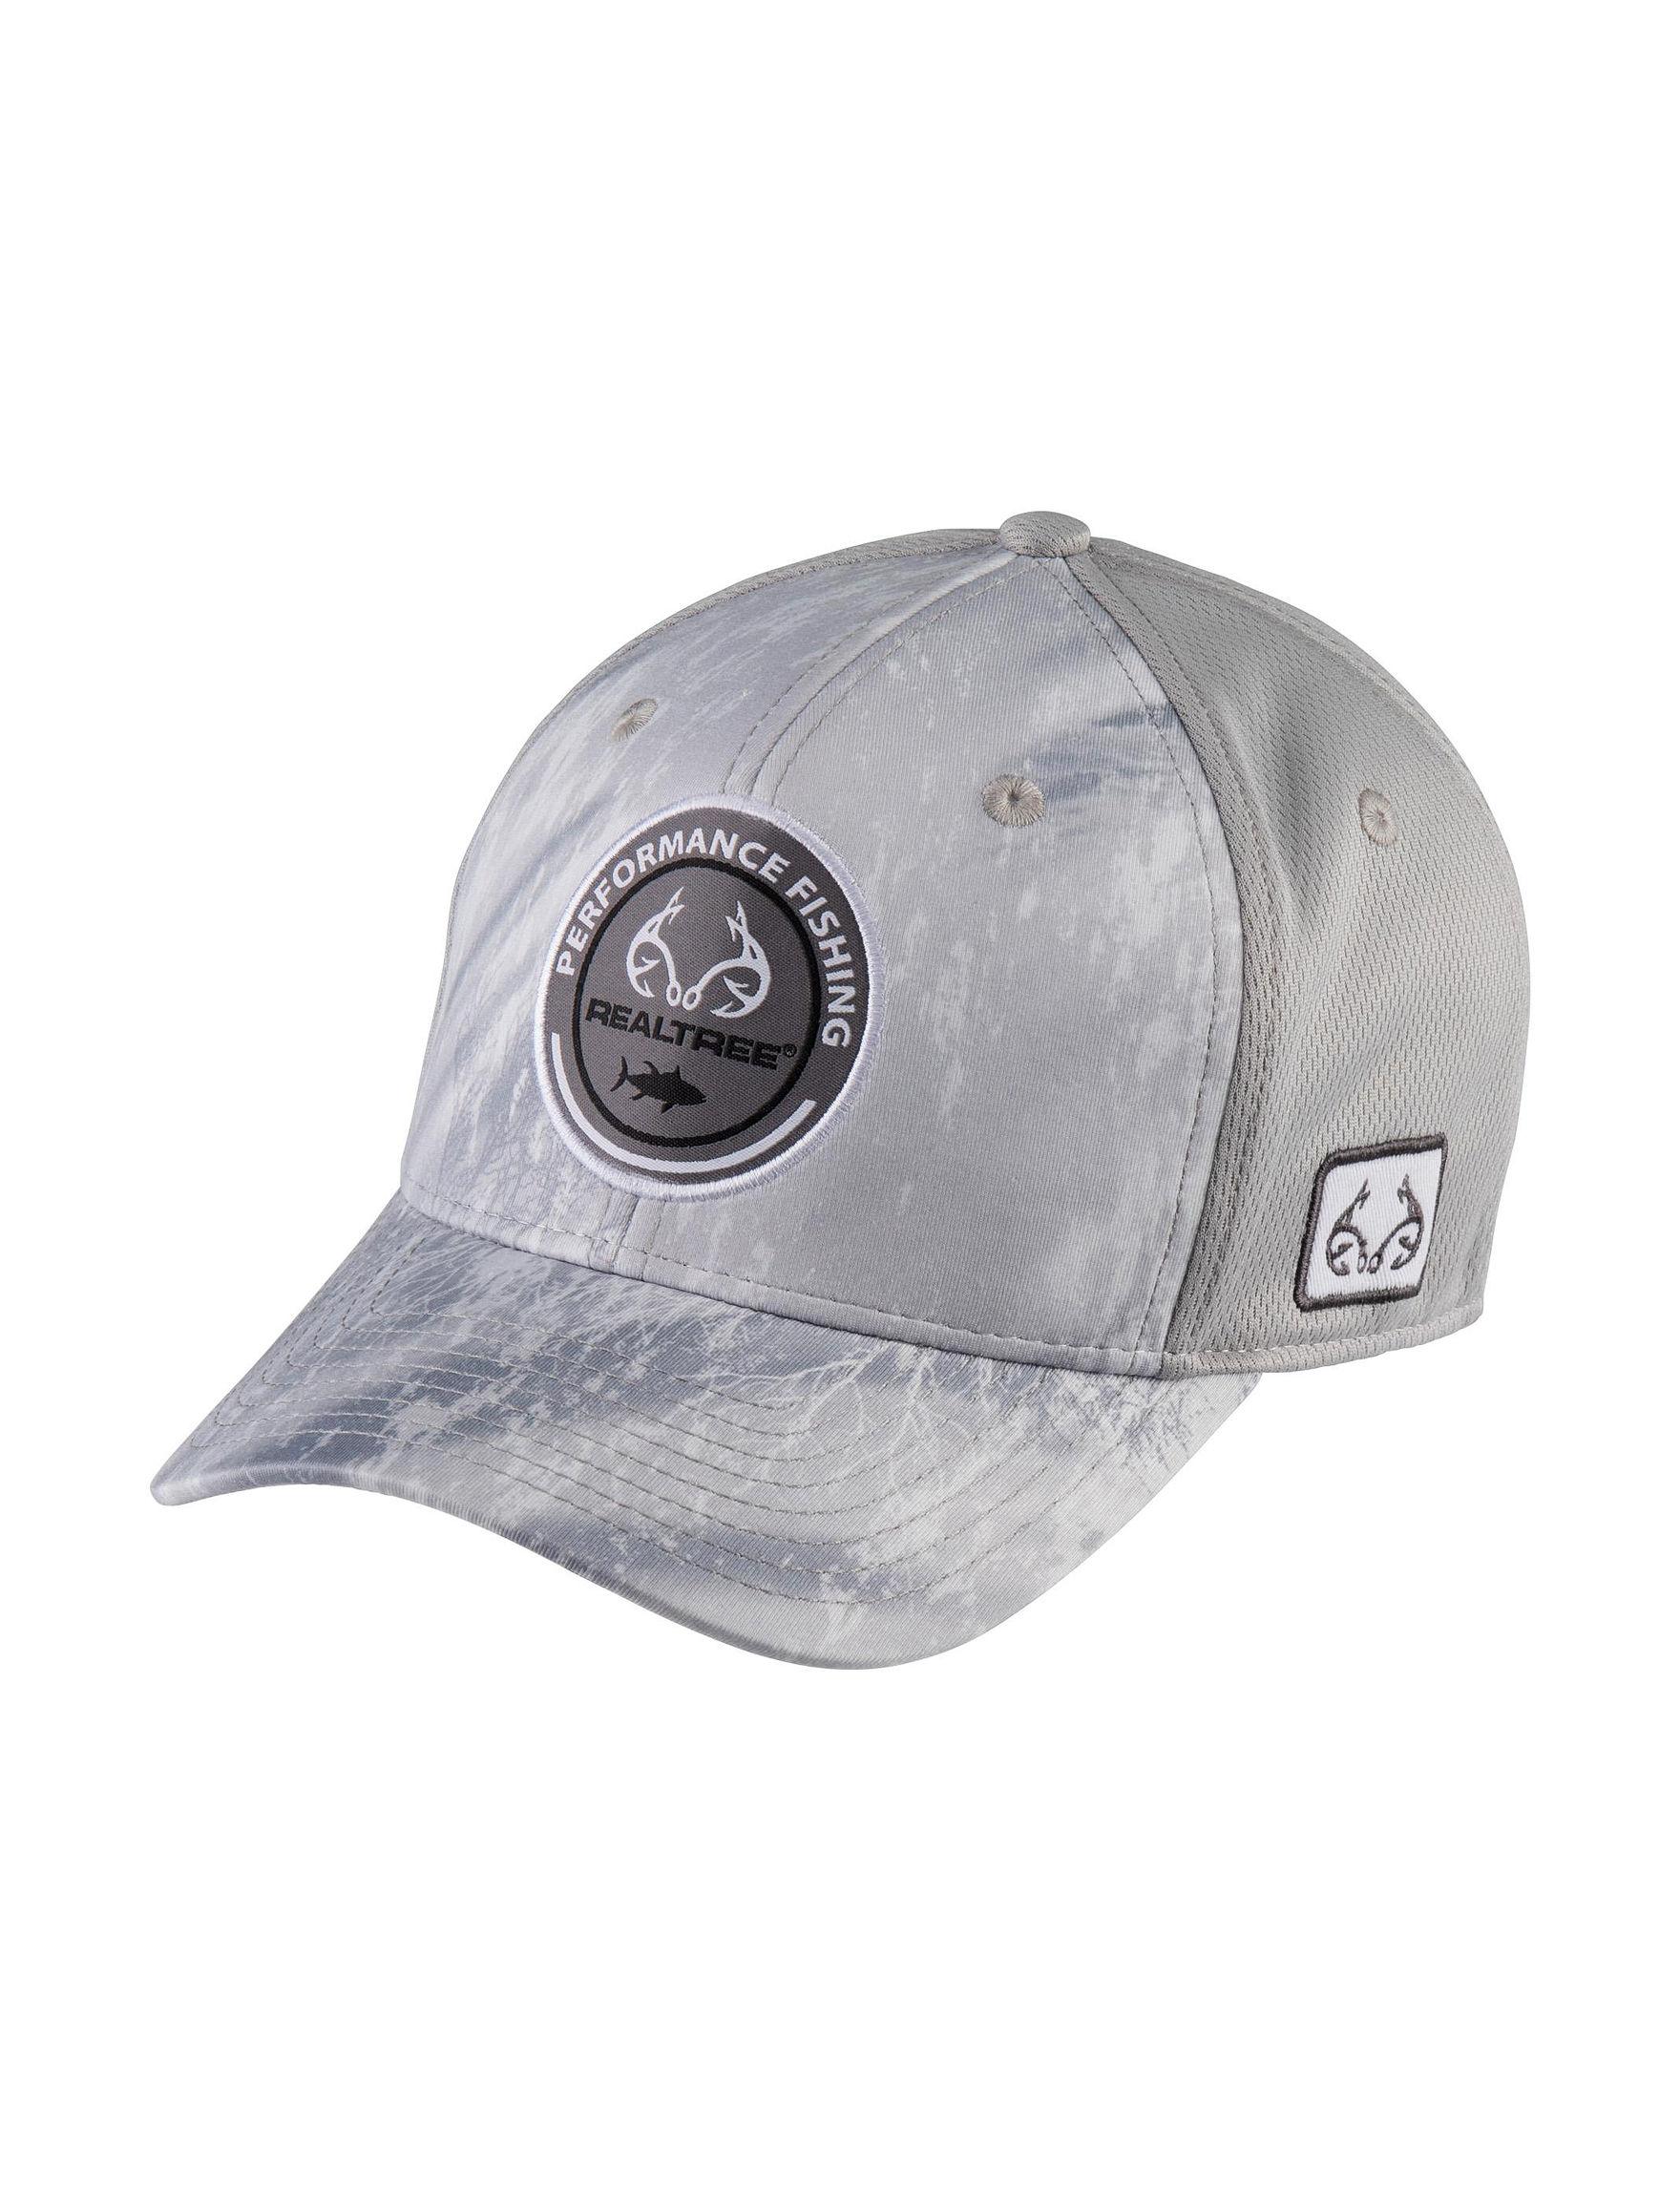 Realtree Grey Hats & Headwear Baseball Caps